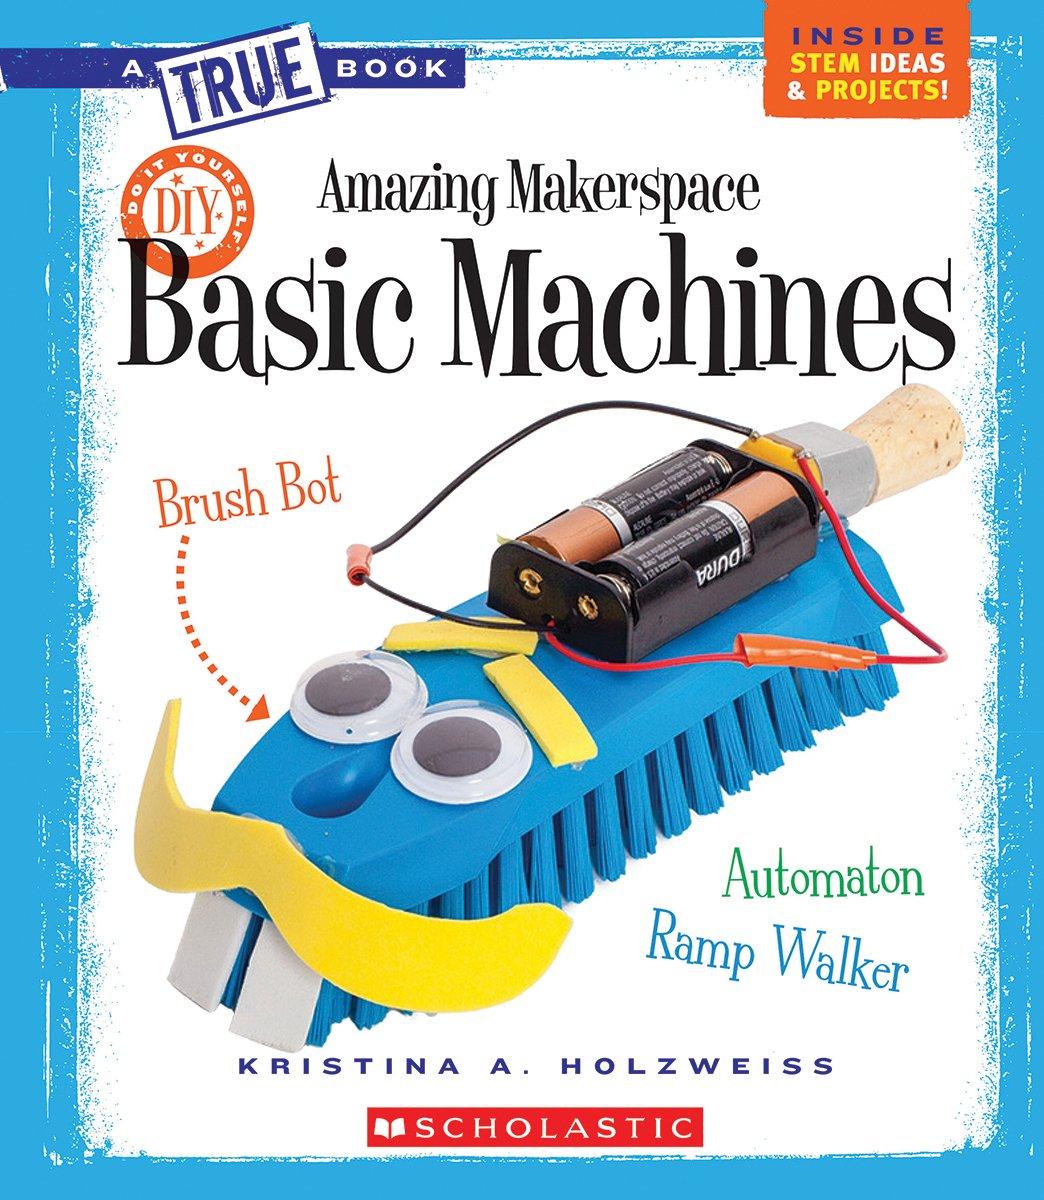 Download Amazing Makerspace DIY Basic Machines (True Books) (True Books: Amazing Makerspace DIY) ebook